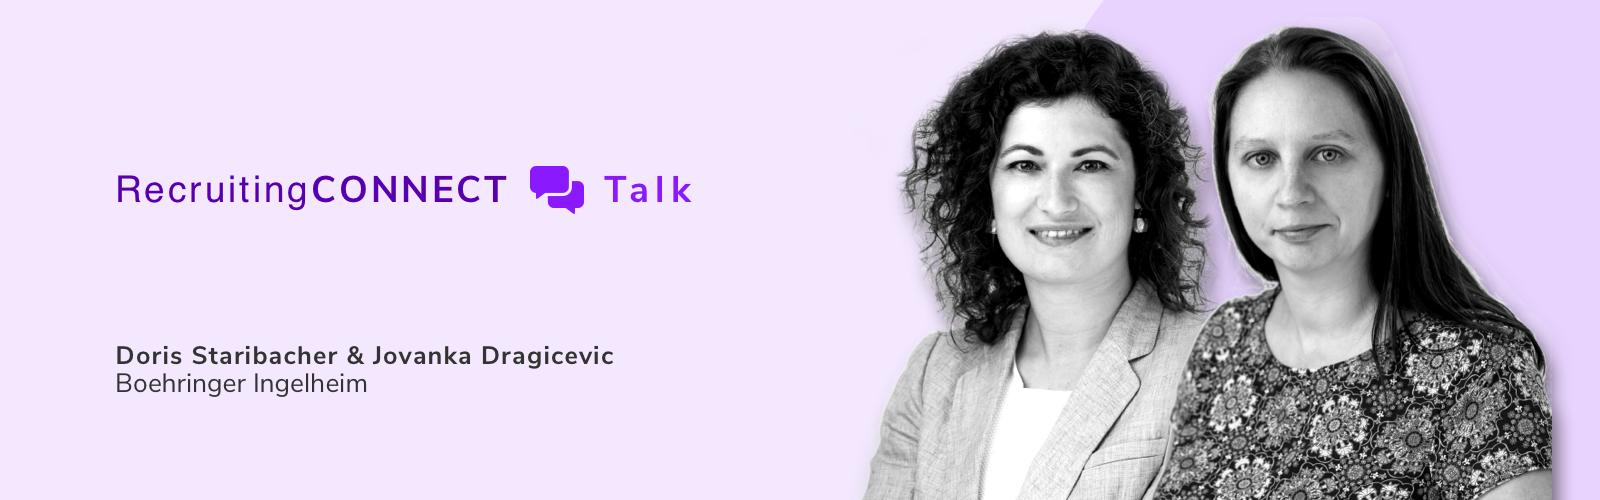 Talentry Webinar RecruitingCONNECT Talk Doris Staribacher Jovanka Dragicevic Boehringer Inhelheim